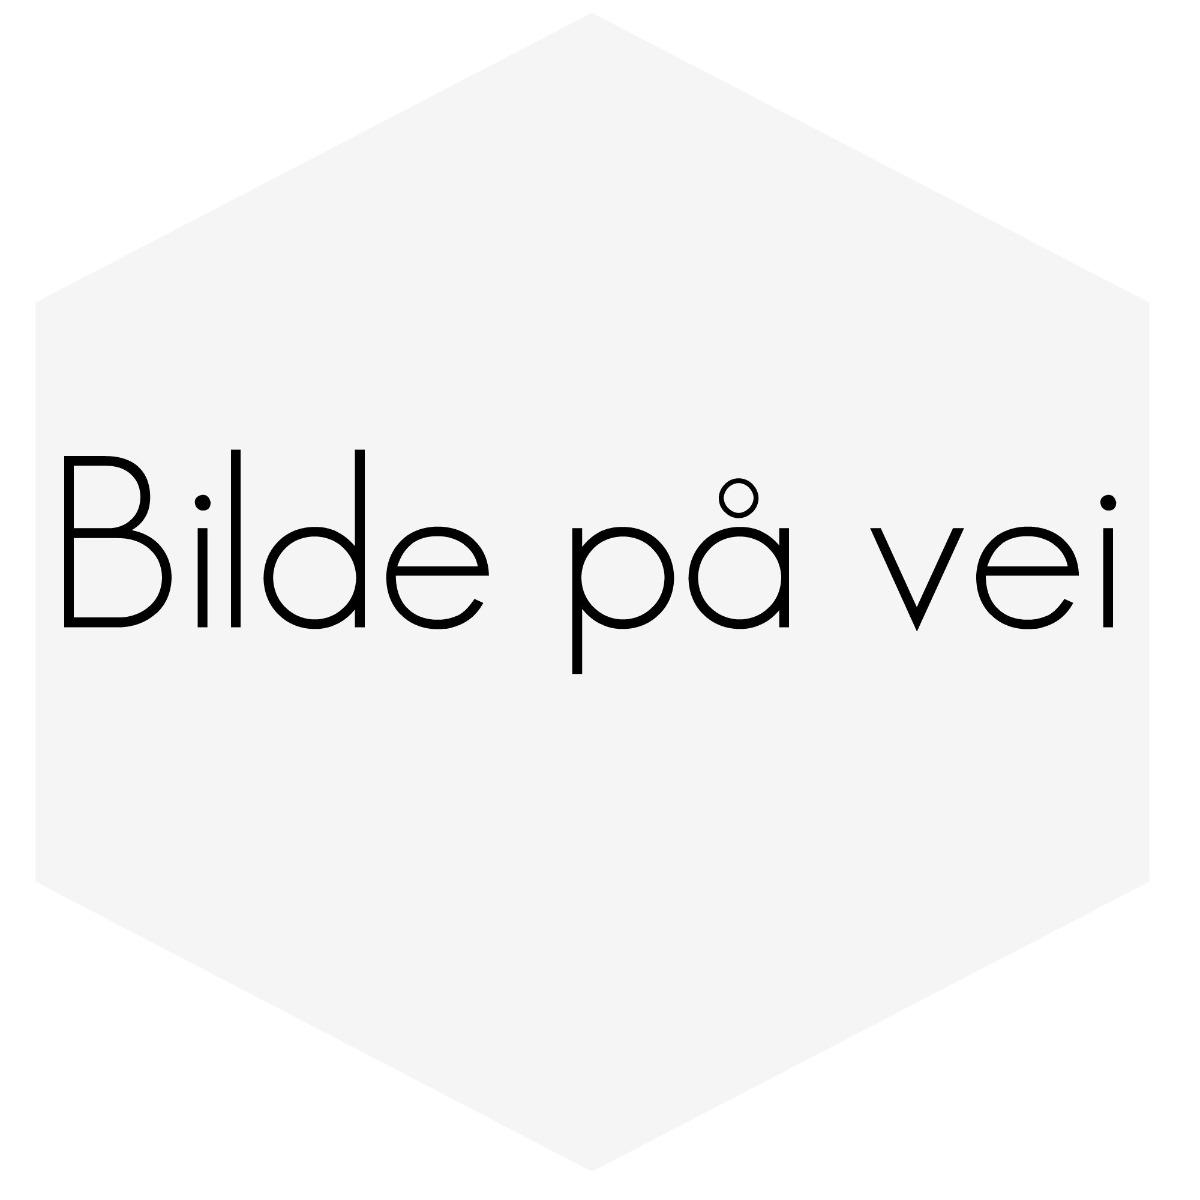 SKO PITLANE FRA SPARCO SORT  VELG STØRRELSE KUN STR 40